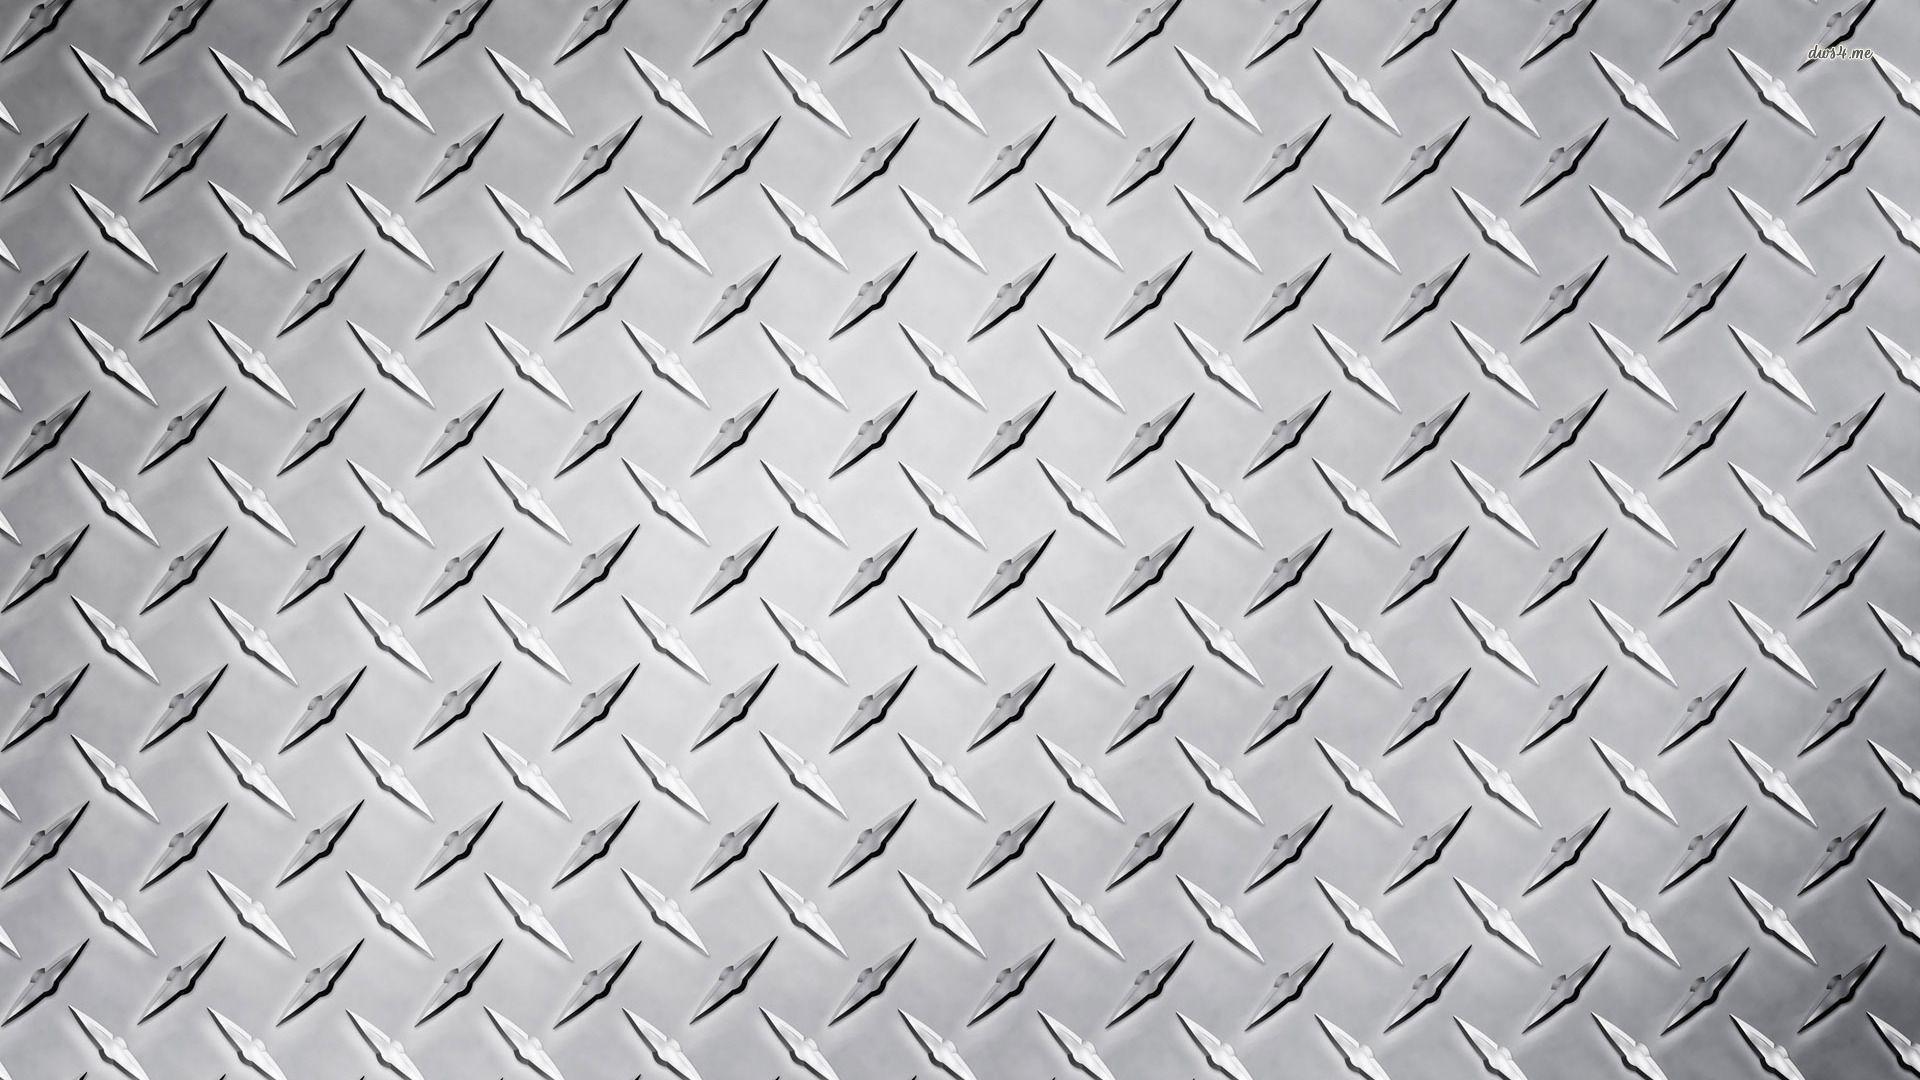 Diamond Plate Wallpapers Top Free Diamond Plate Backgrounds Wallpaperaccess